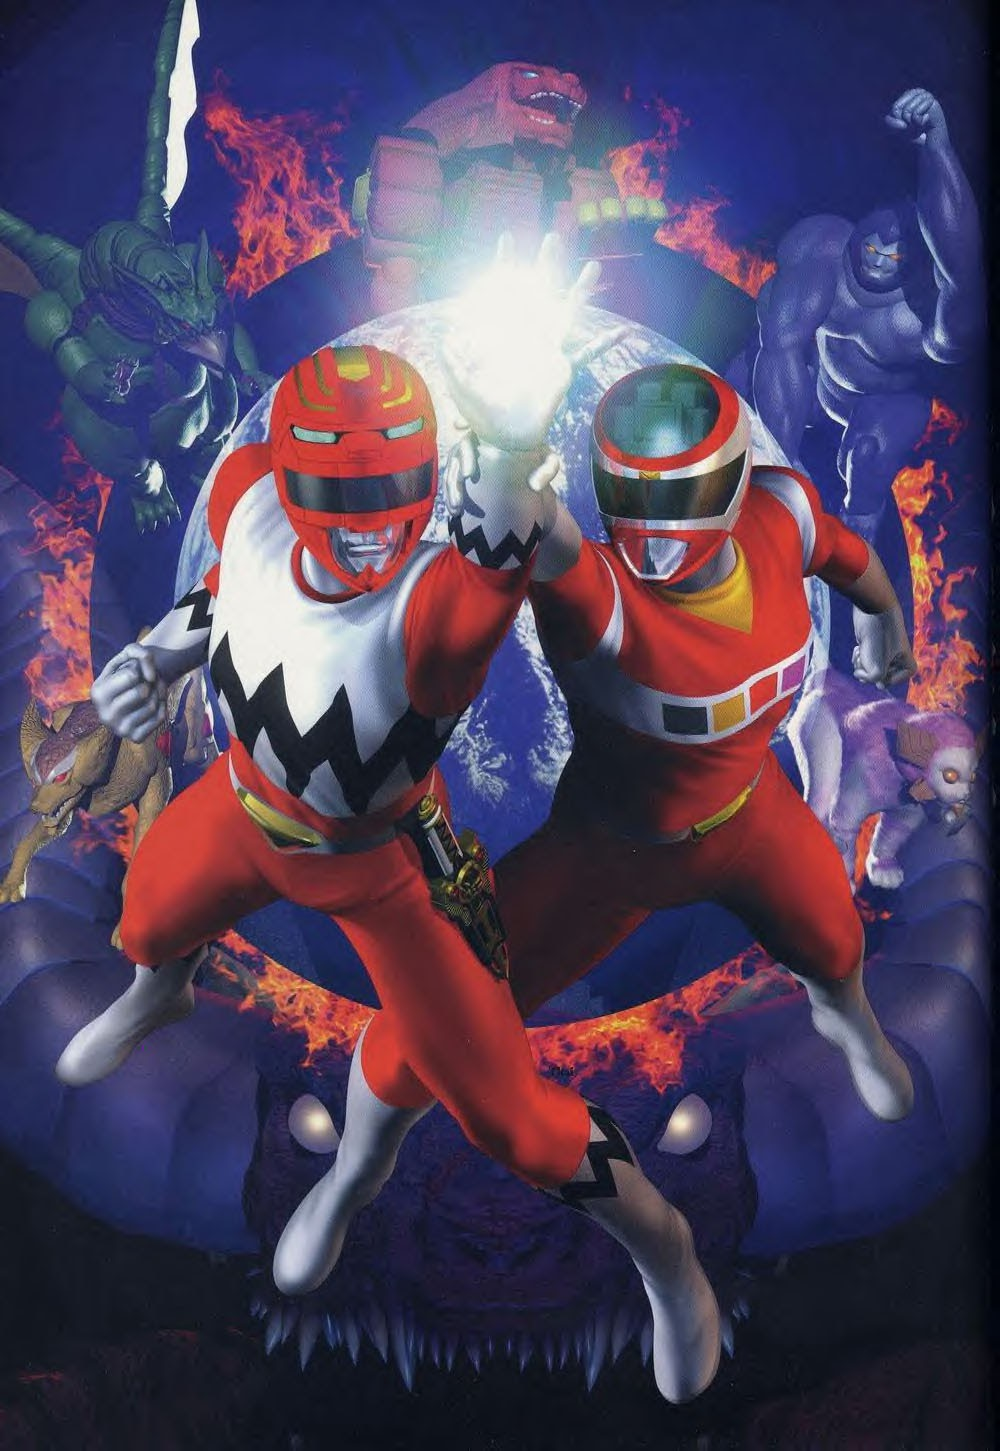 Seijuu Sentai Gingaman VS Megaranger